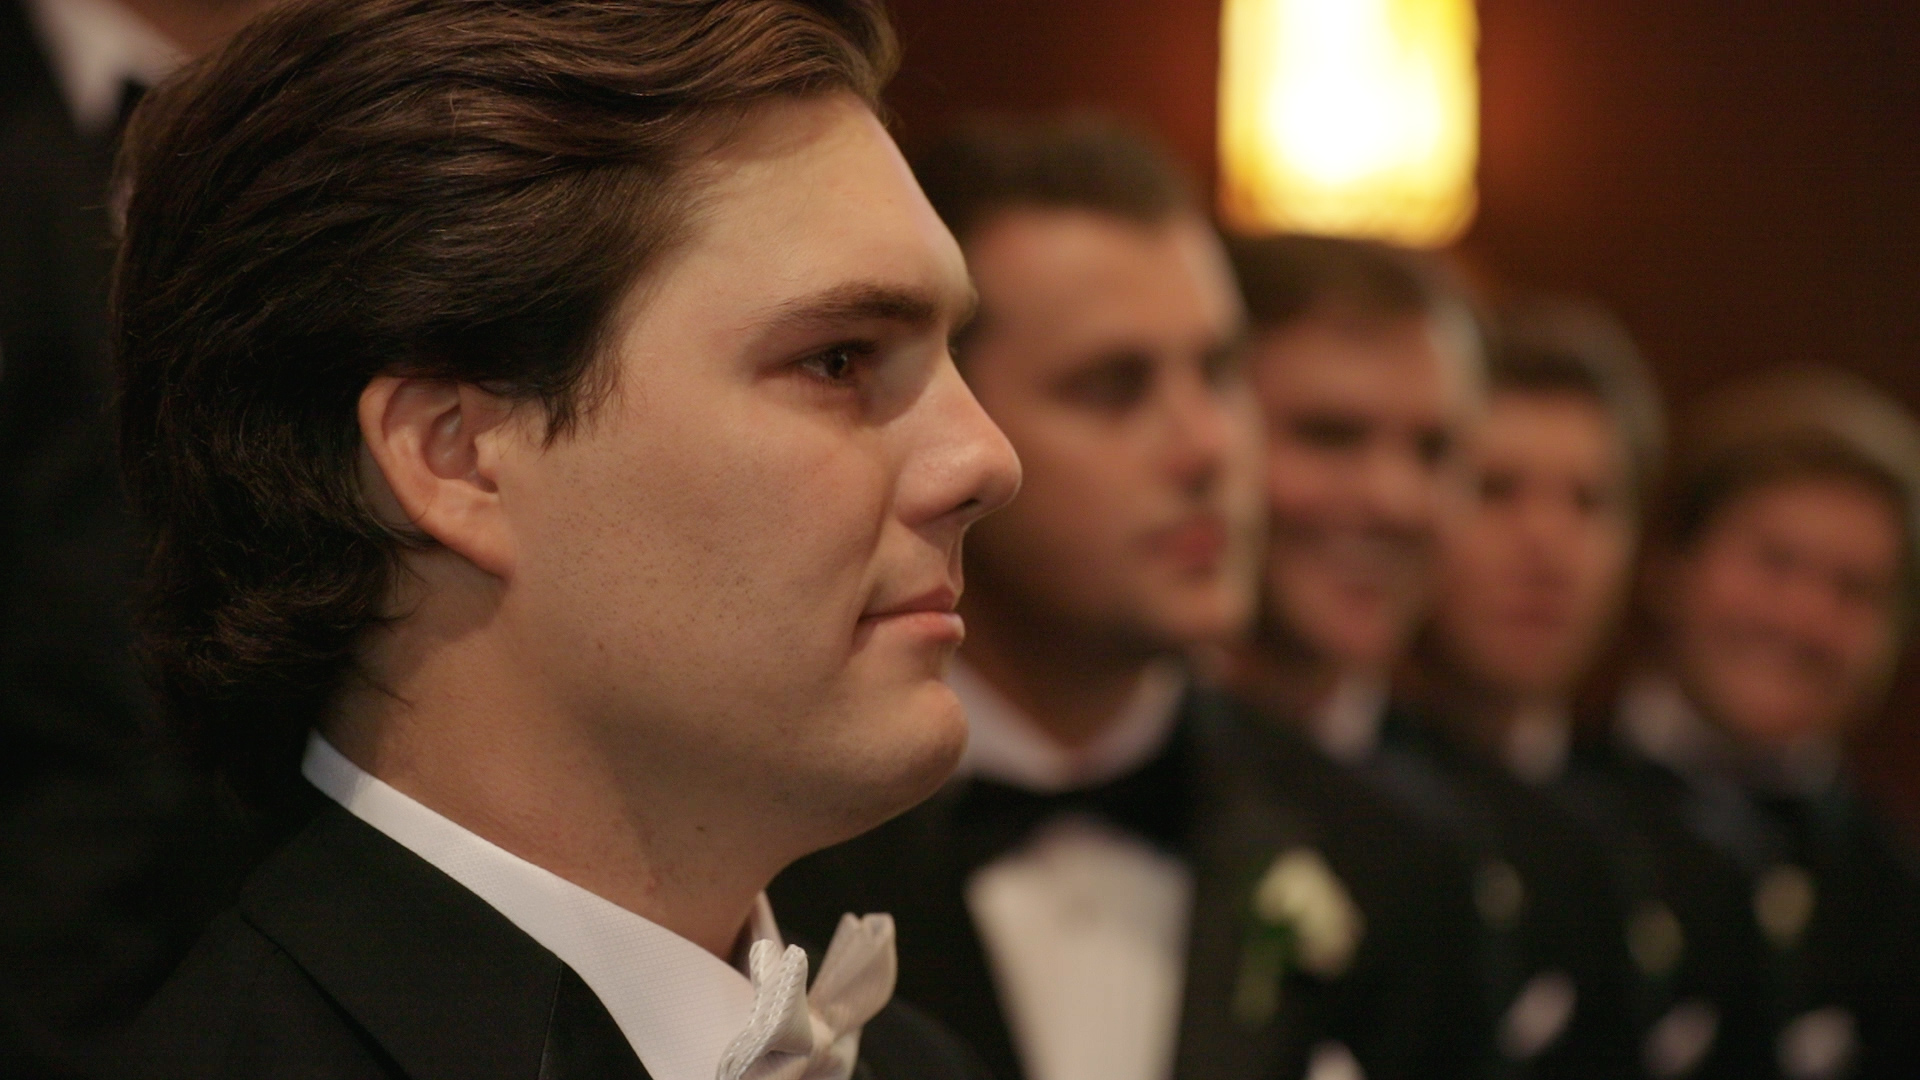 Covington Wedding Video - Bride Film - Groom